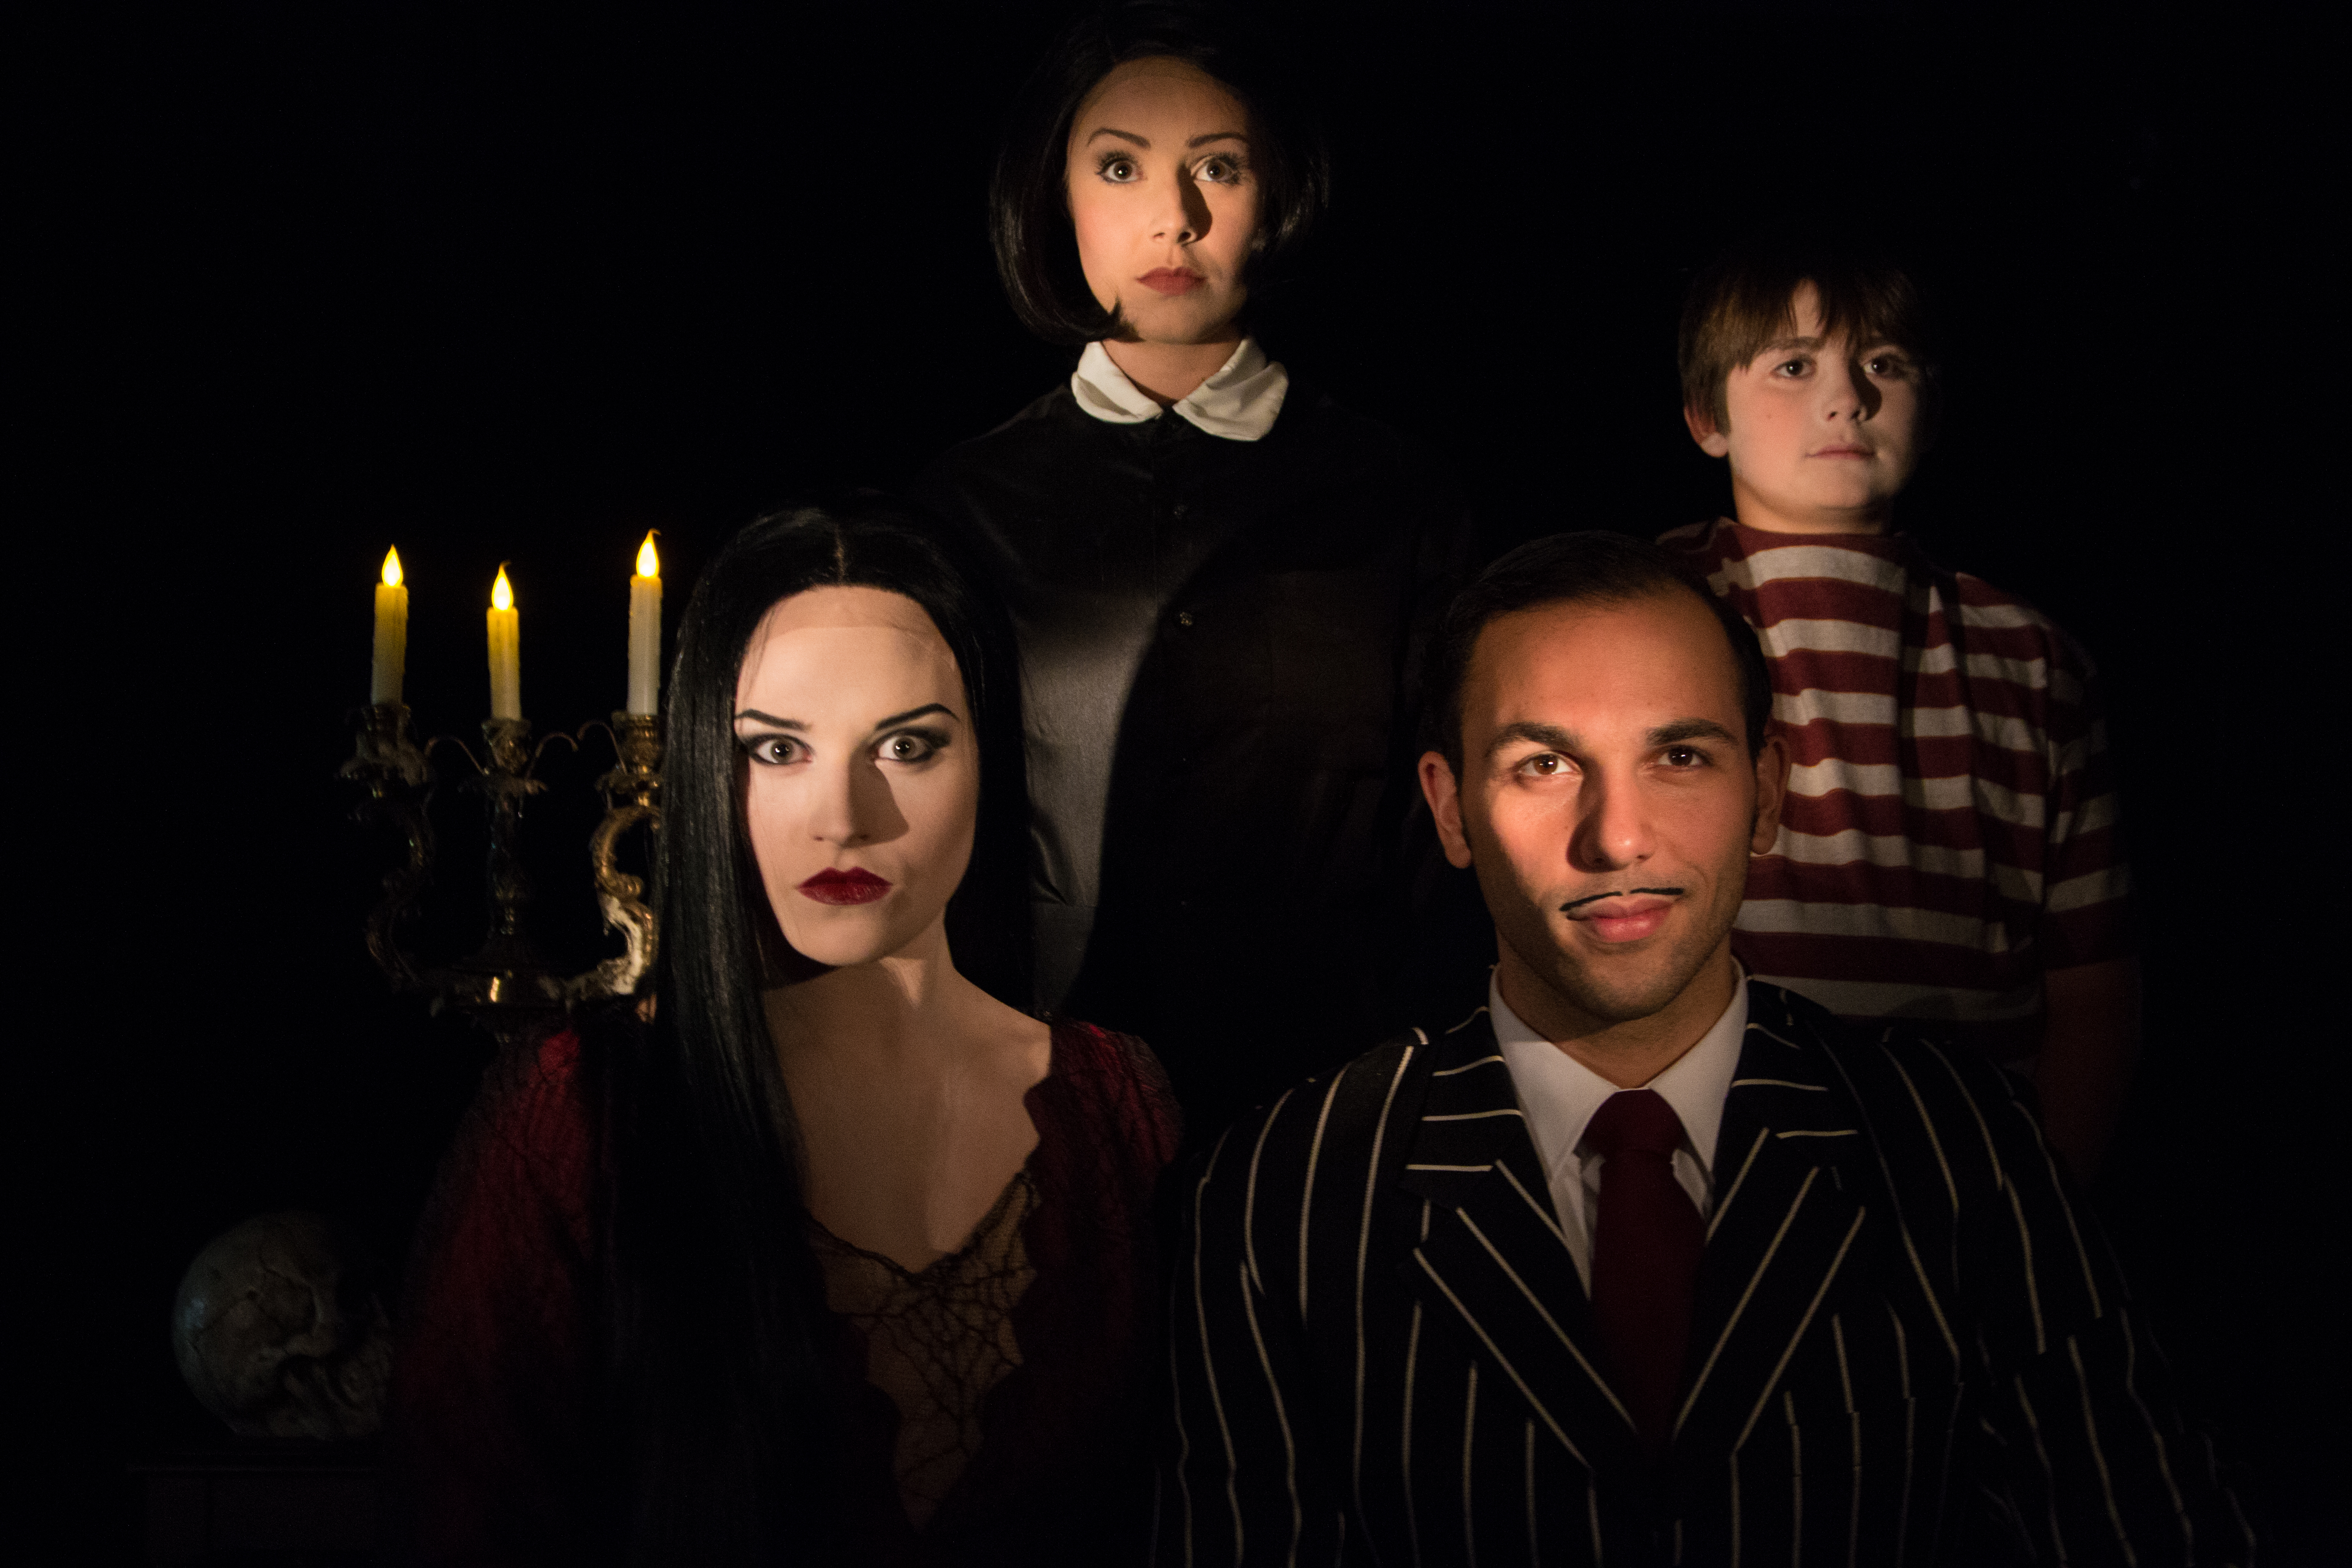 Gomez Addams in The Addams Family